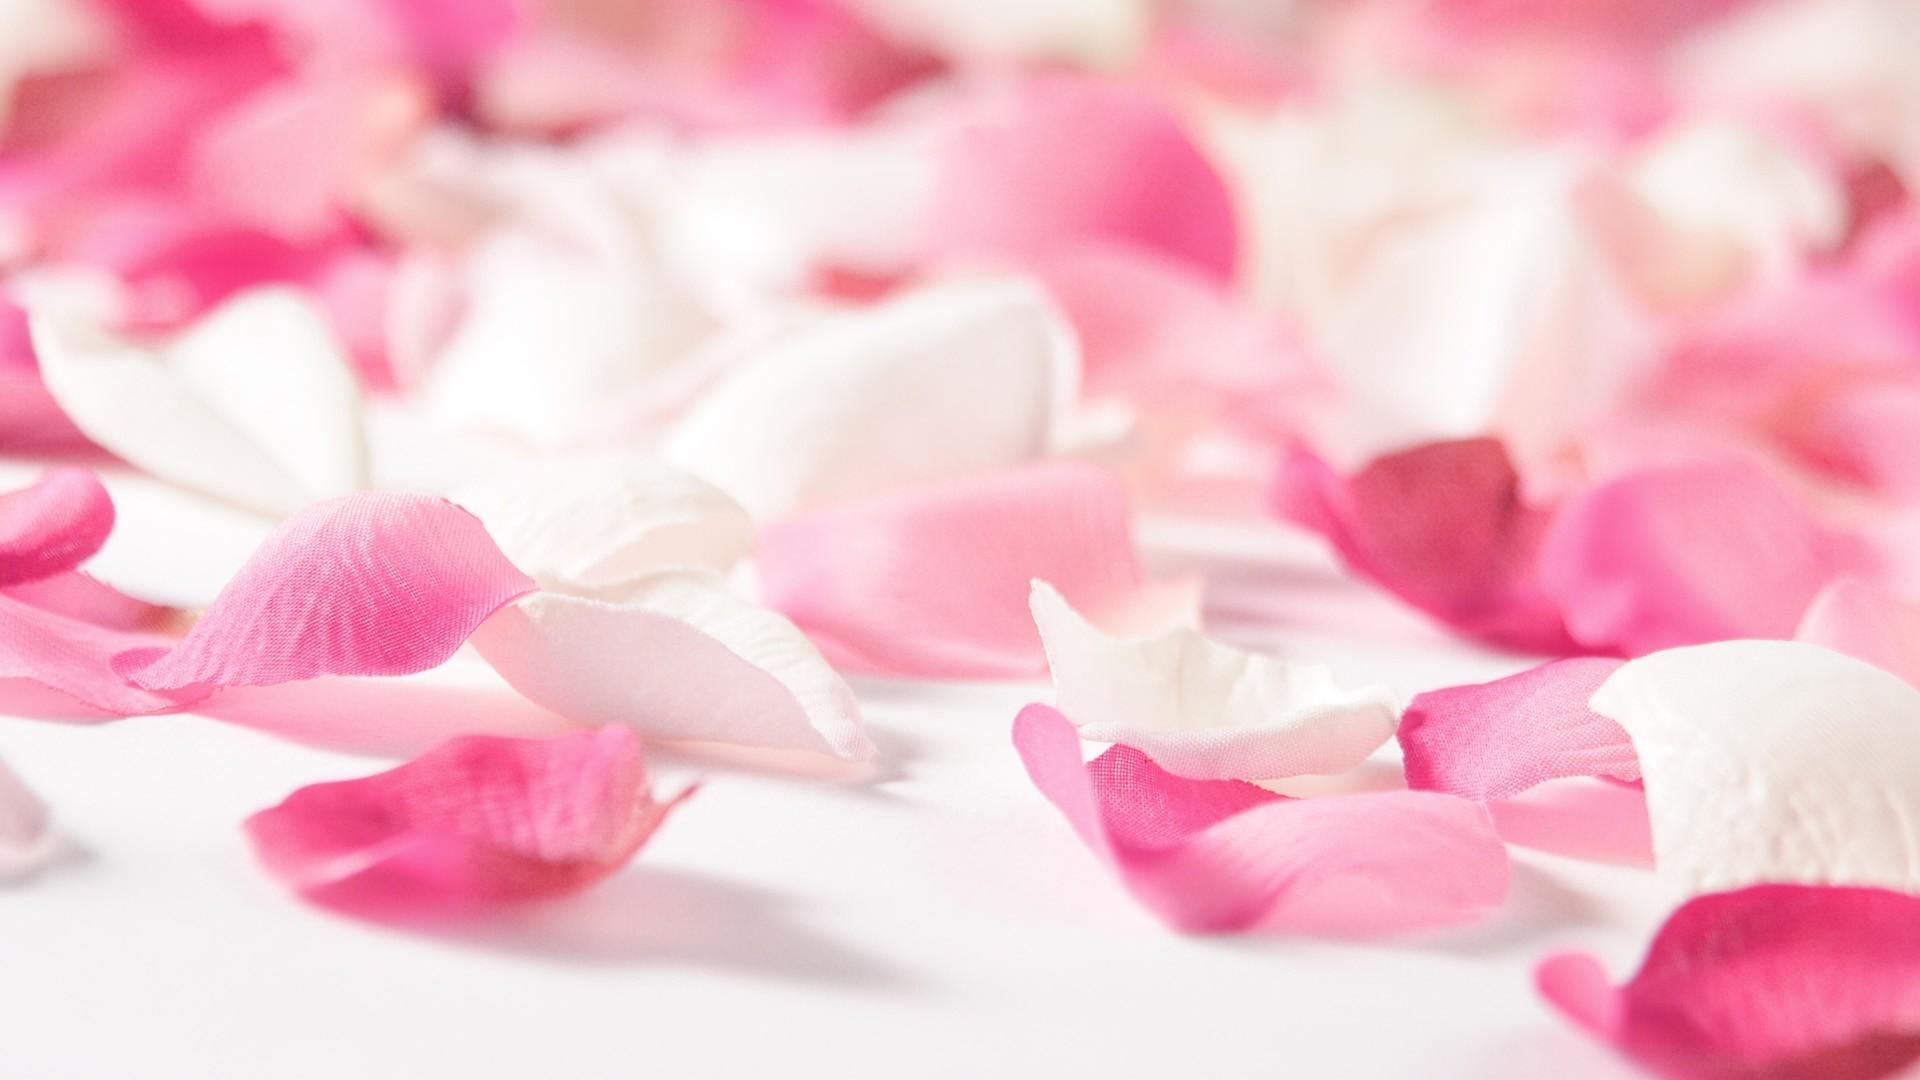 Light Pink Flower Green Blurry Background Hd Wide Wallpaper For